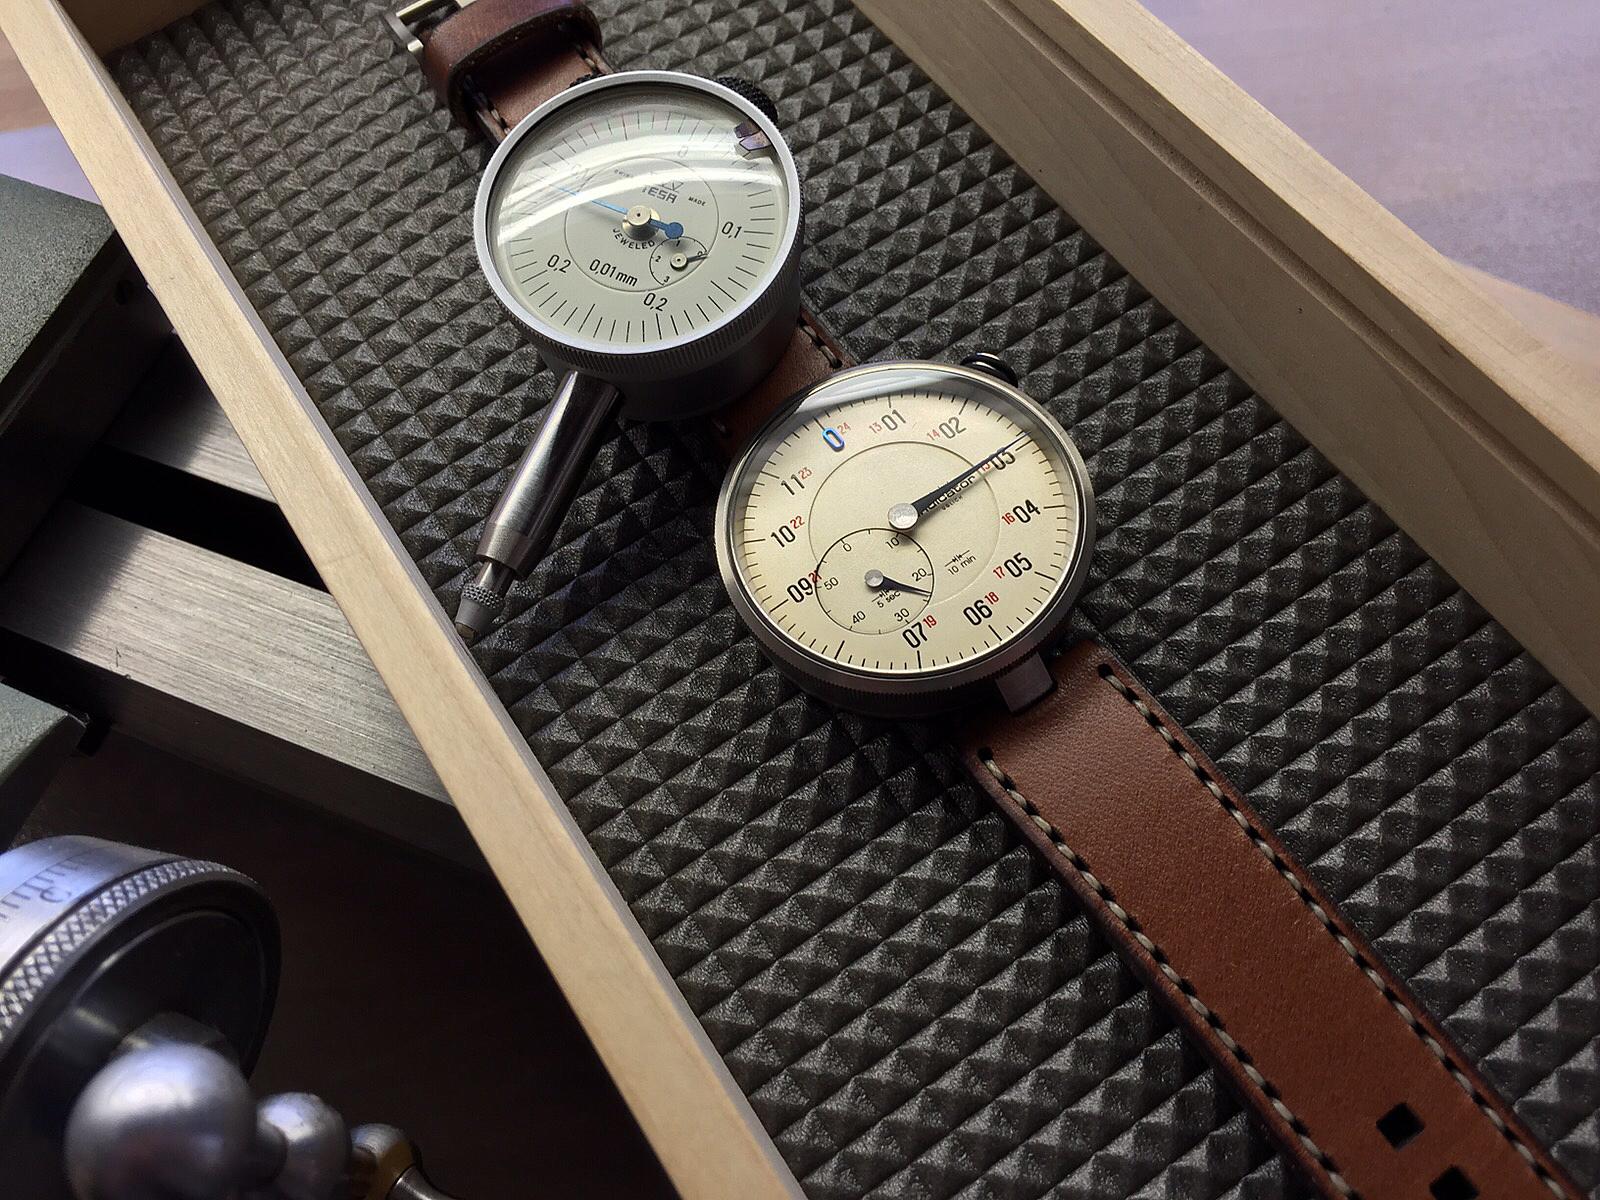 New RUSSIAN time tool INDICATOR-img-20151003-wa0008.jpg